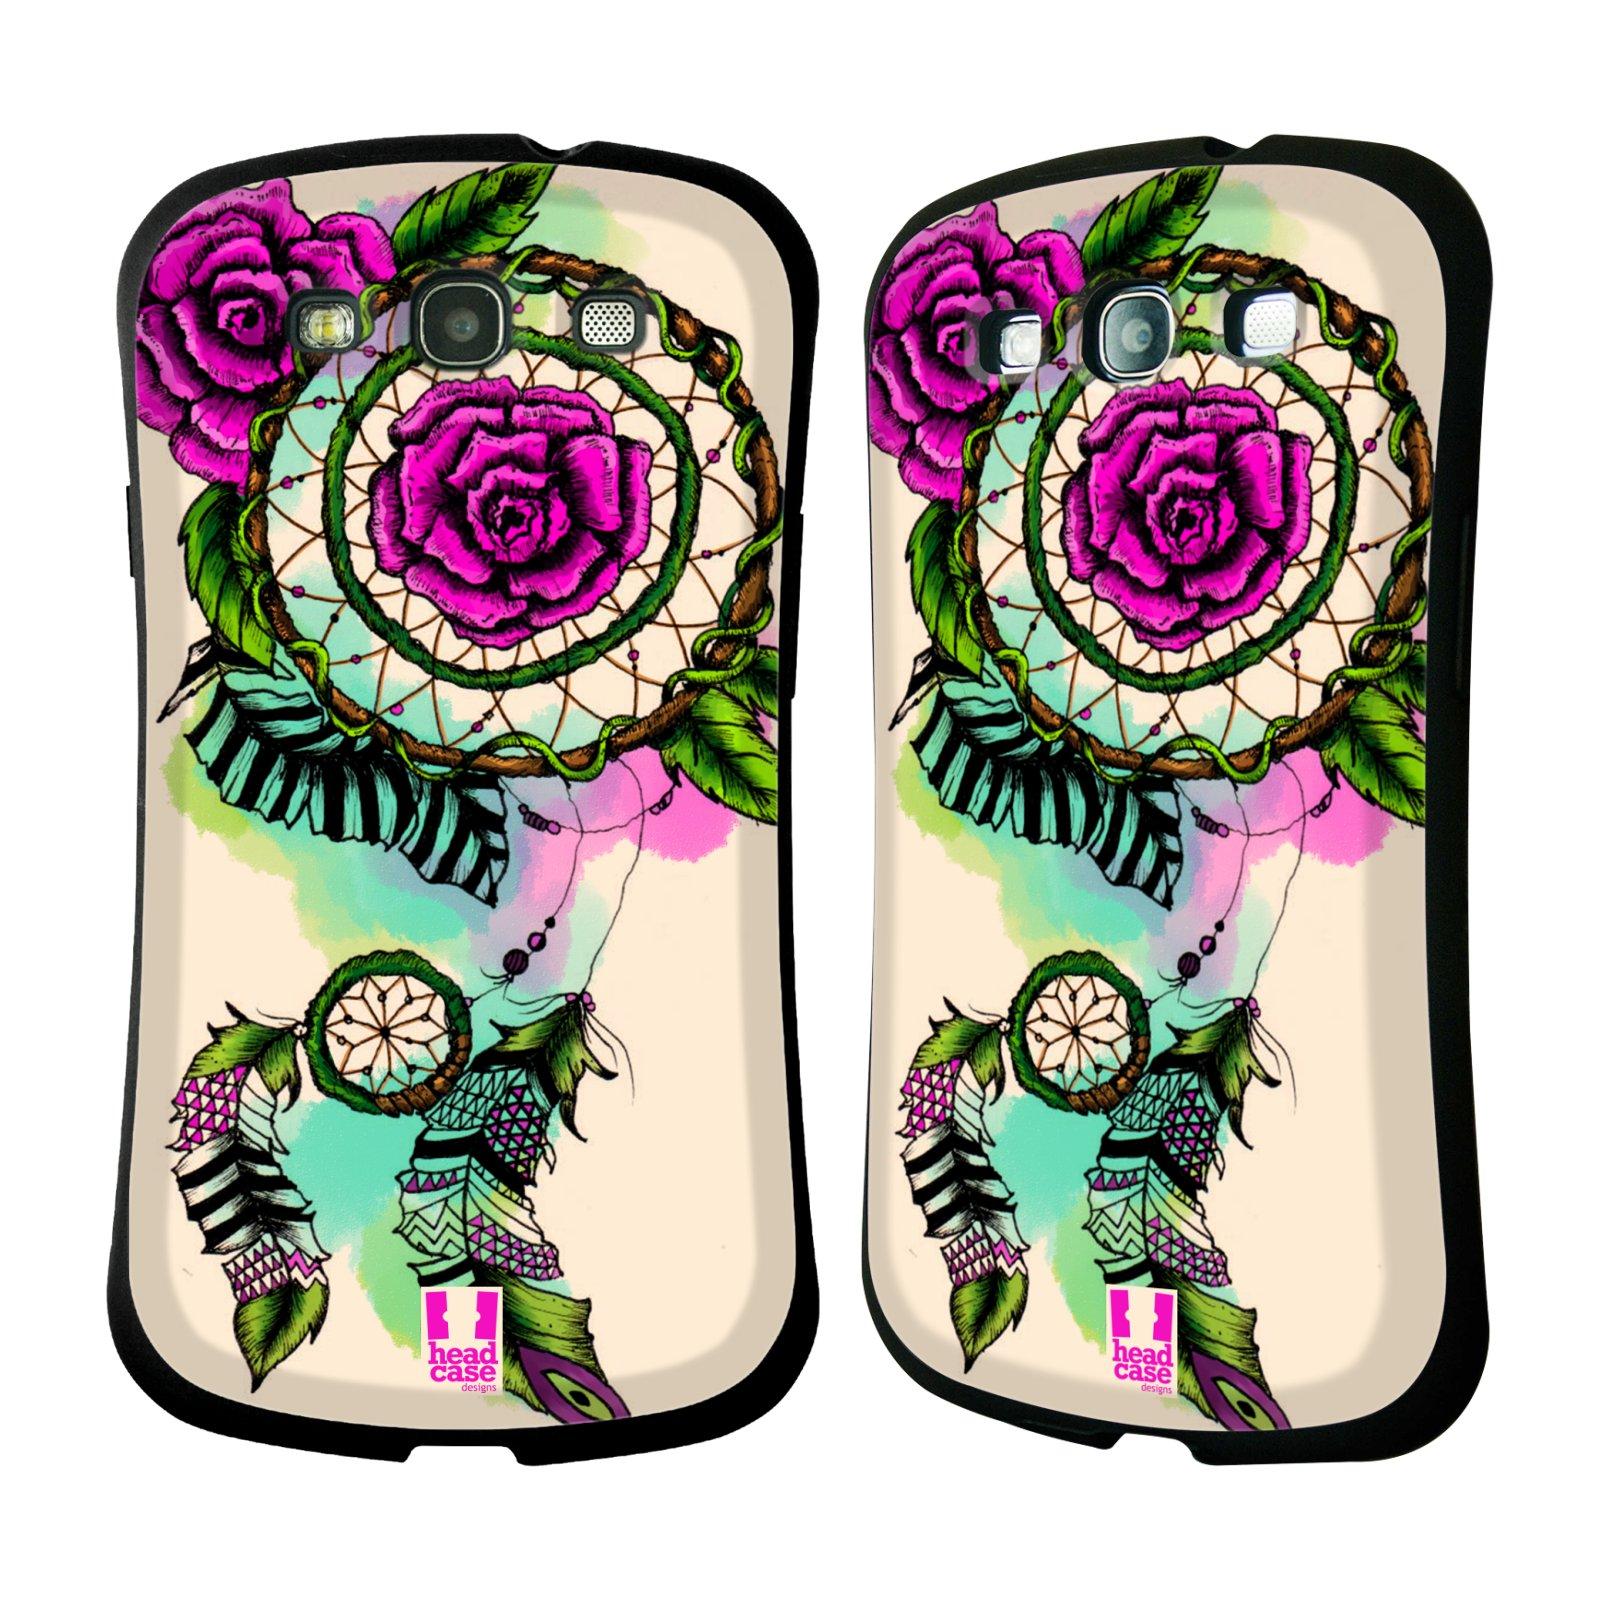 Nárazuvzdorné pouzdro na mobil Samsung Galaxy S3 Neo HEAD CASE BLOOM ROSE (Odolný nárazuvzdorný silikonový kryt či obal na mobilní telefon Samsung Galaxy S3 Neo GT-i9301i)